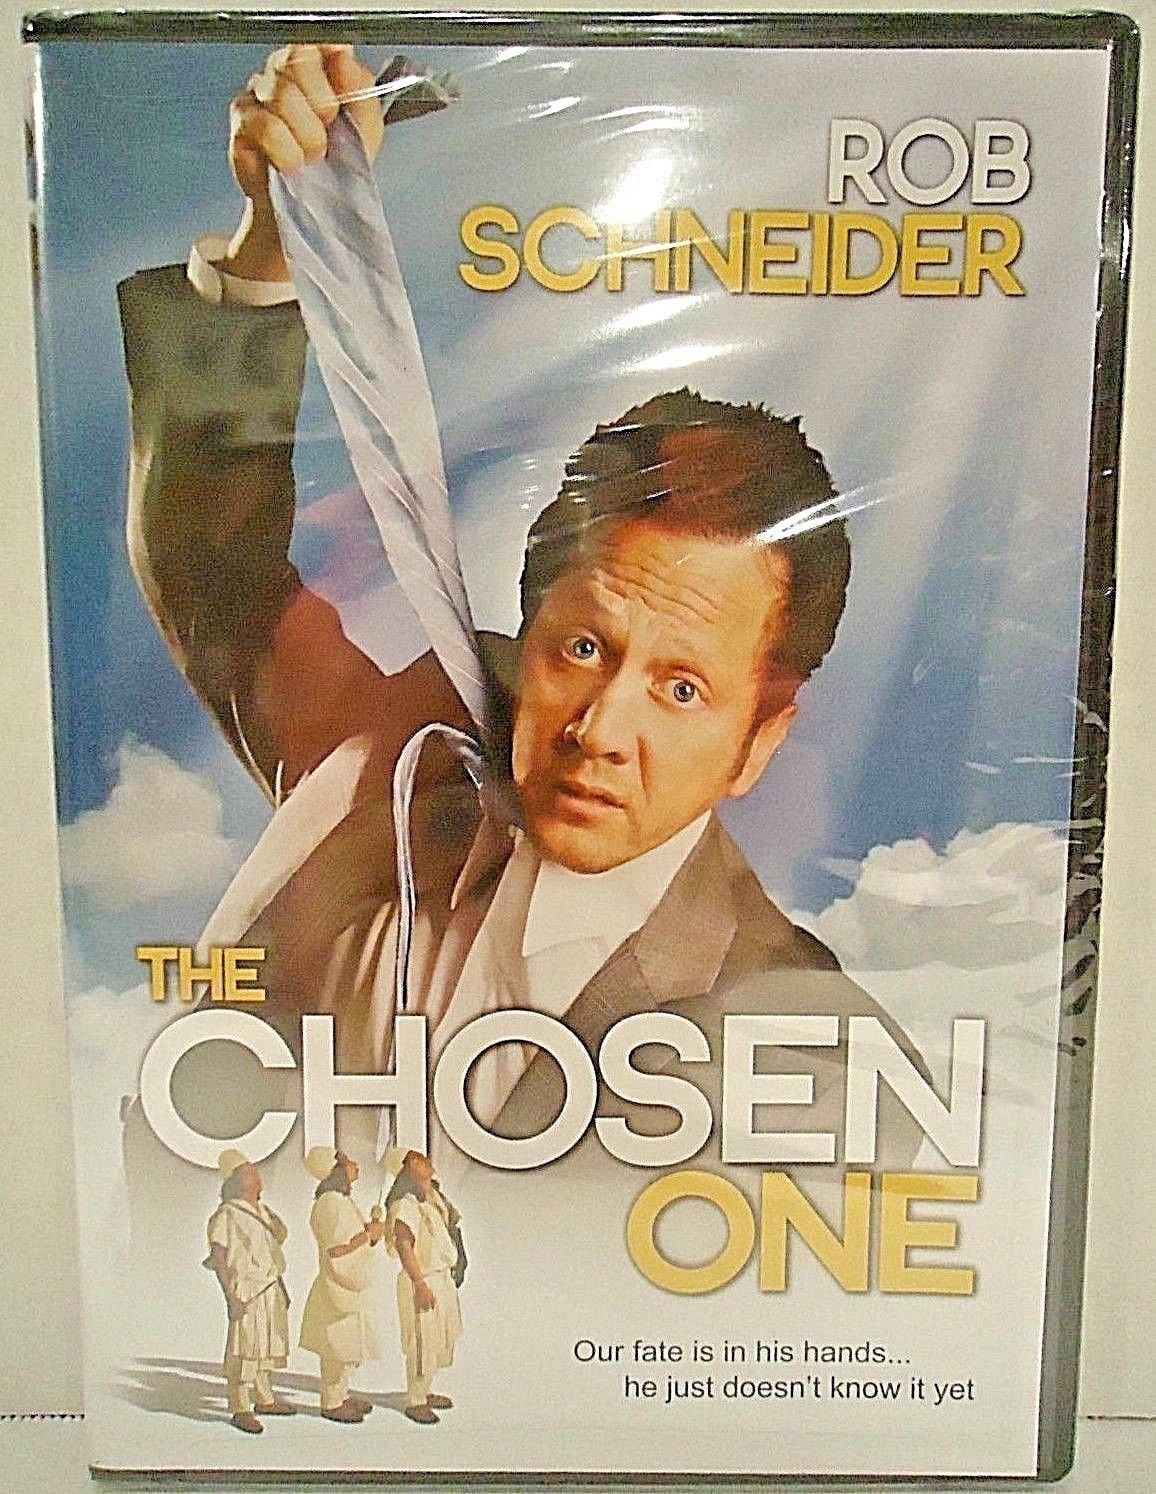 THE CHOSEN ONE - DVD - ROB SCHNEIDER - BRAND NEW - SEALED - COMEDY - MOVIE